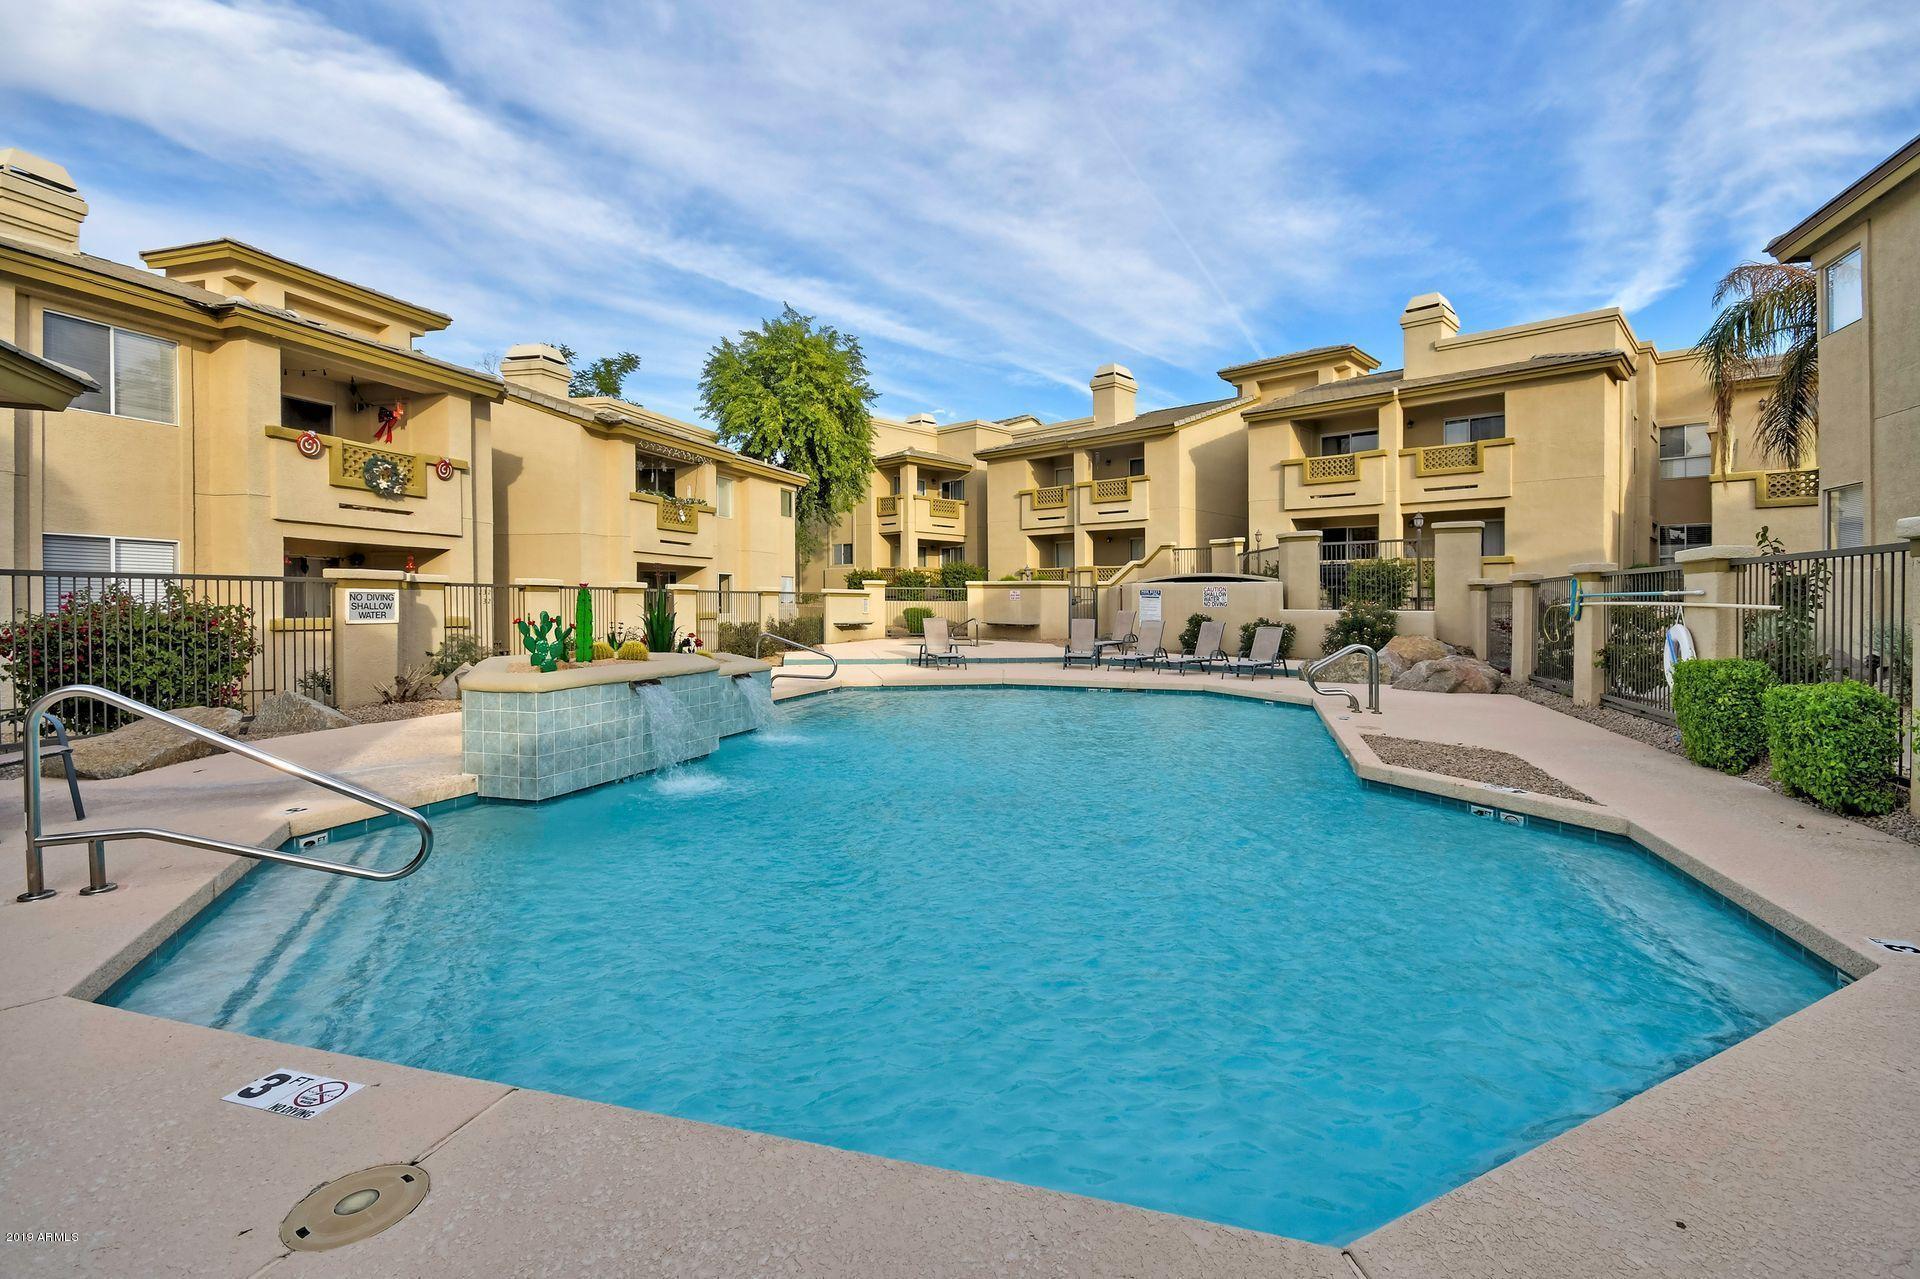 Photo of 1880 E MORTEN Avenue #253, Phoenix, AZ 85020